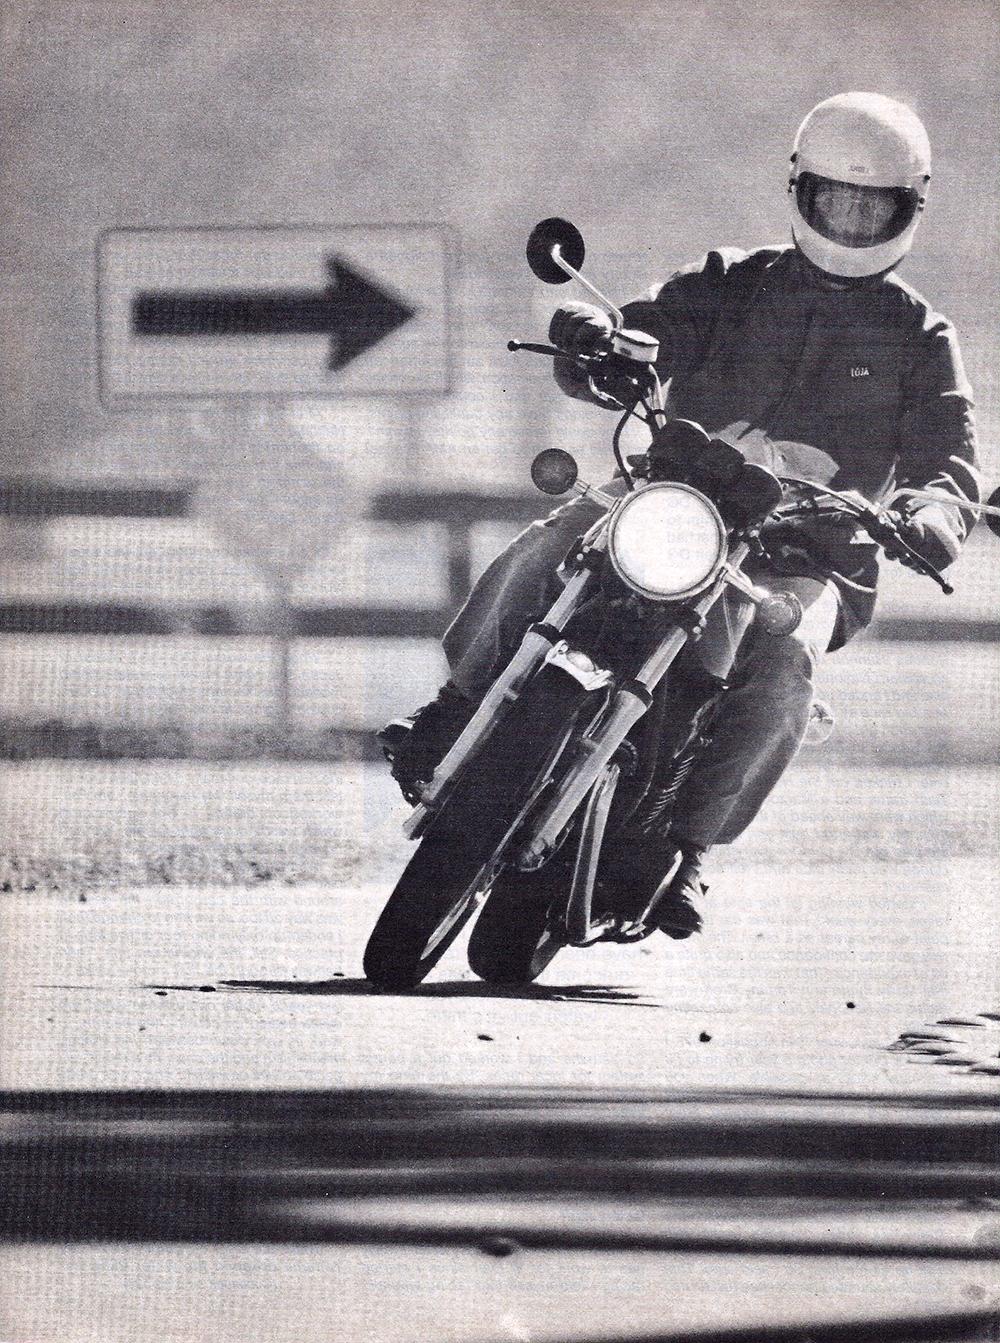 1978 Yamaha XS750E road test 1.jpg